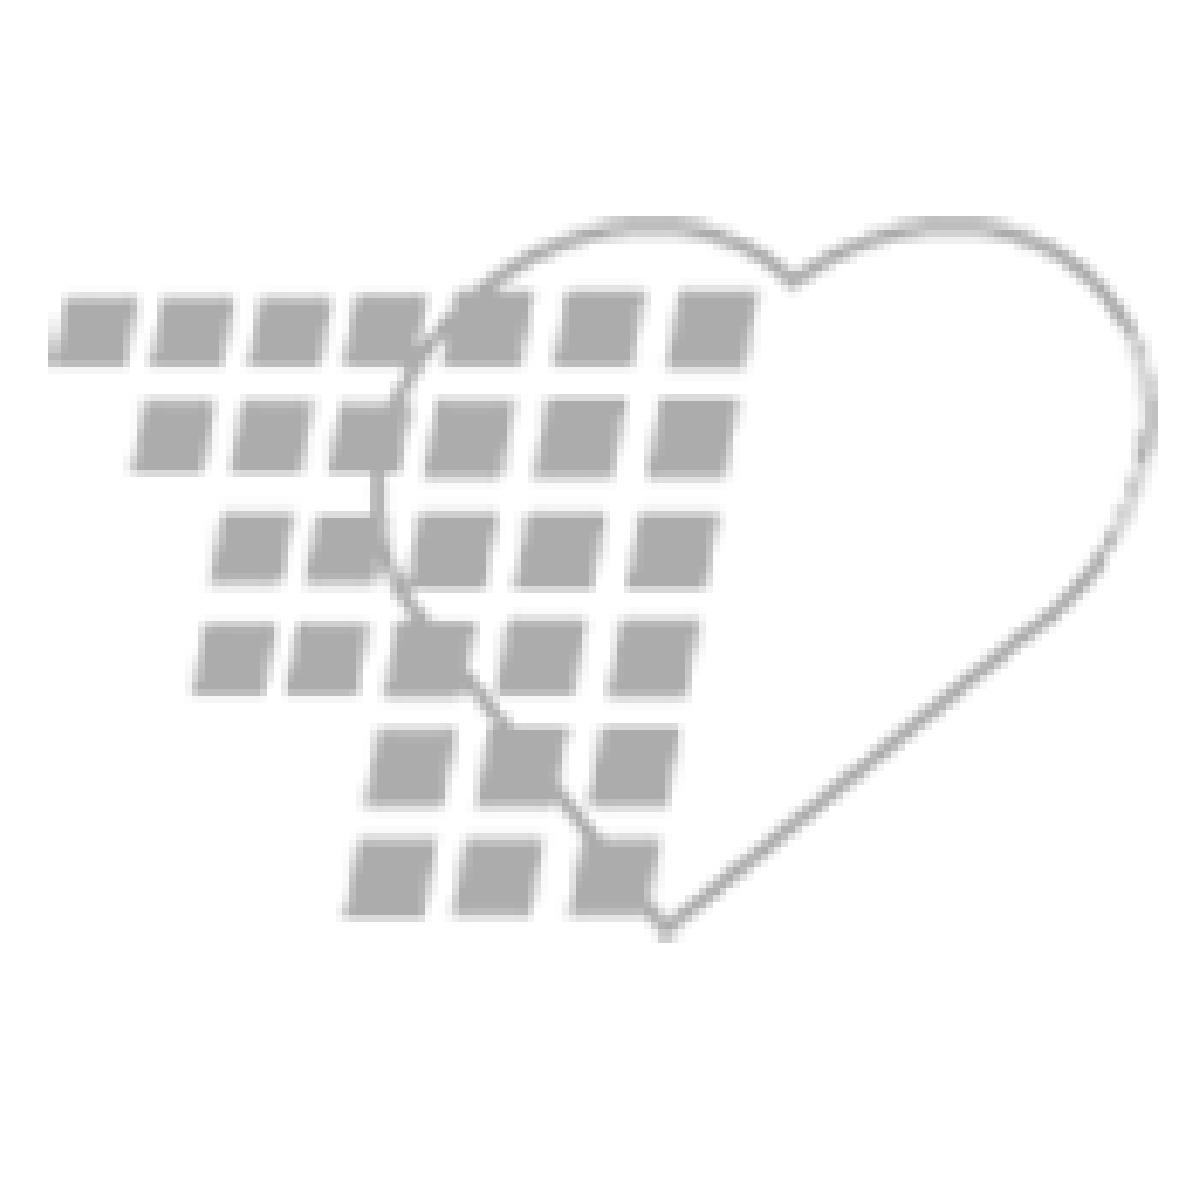 11-81-0003-BGESM - SimLeggings® - Small Beige